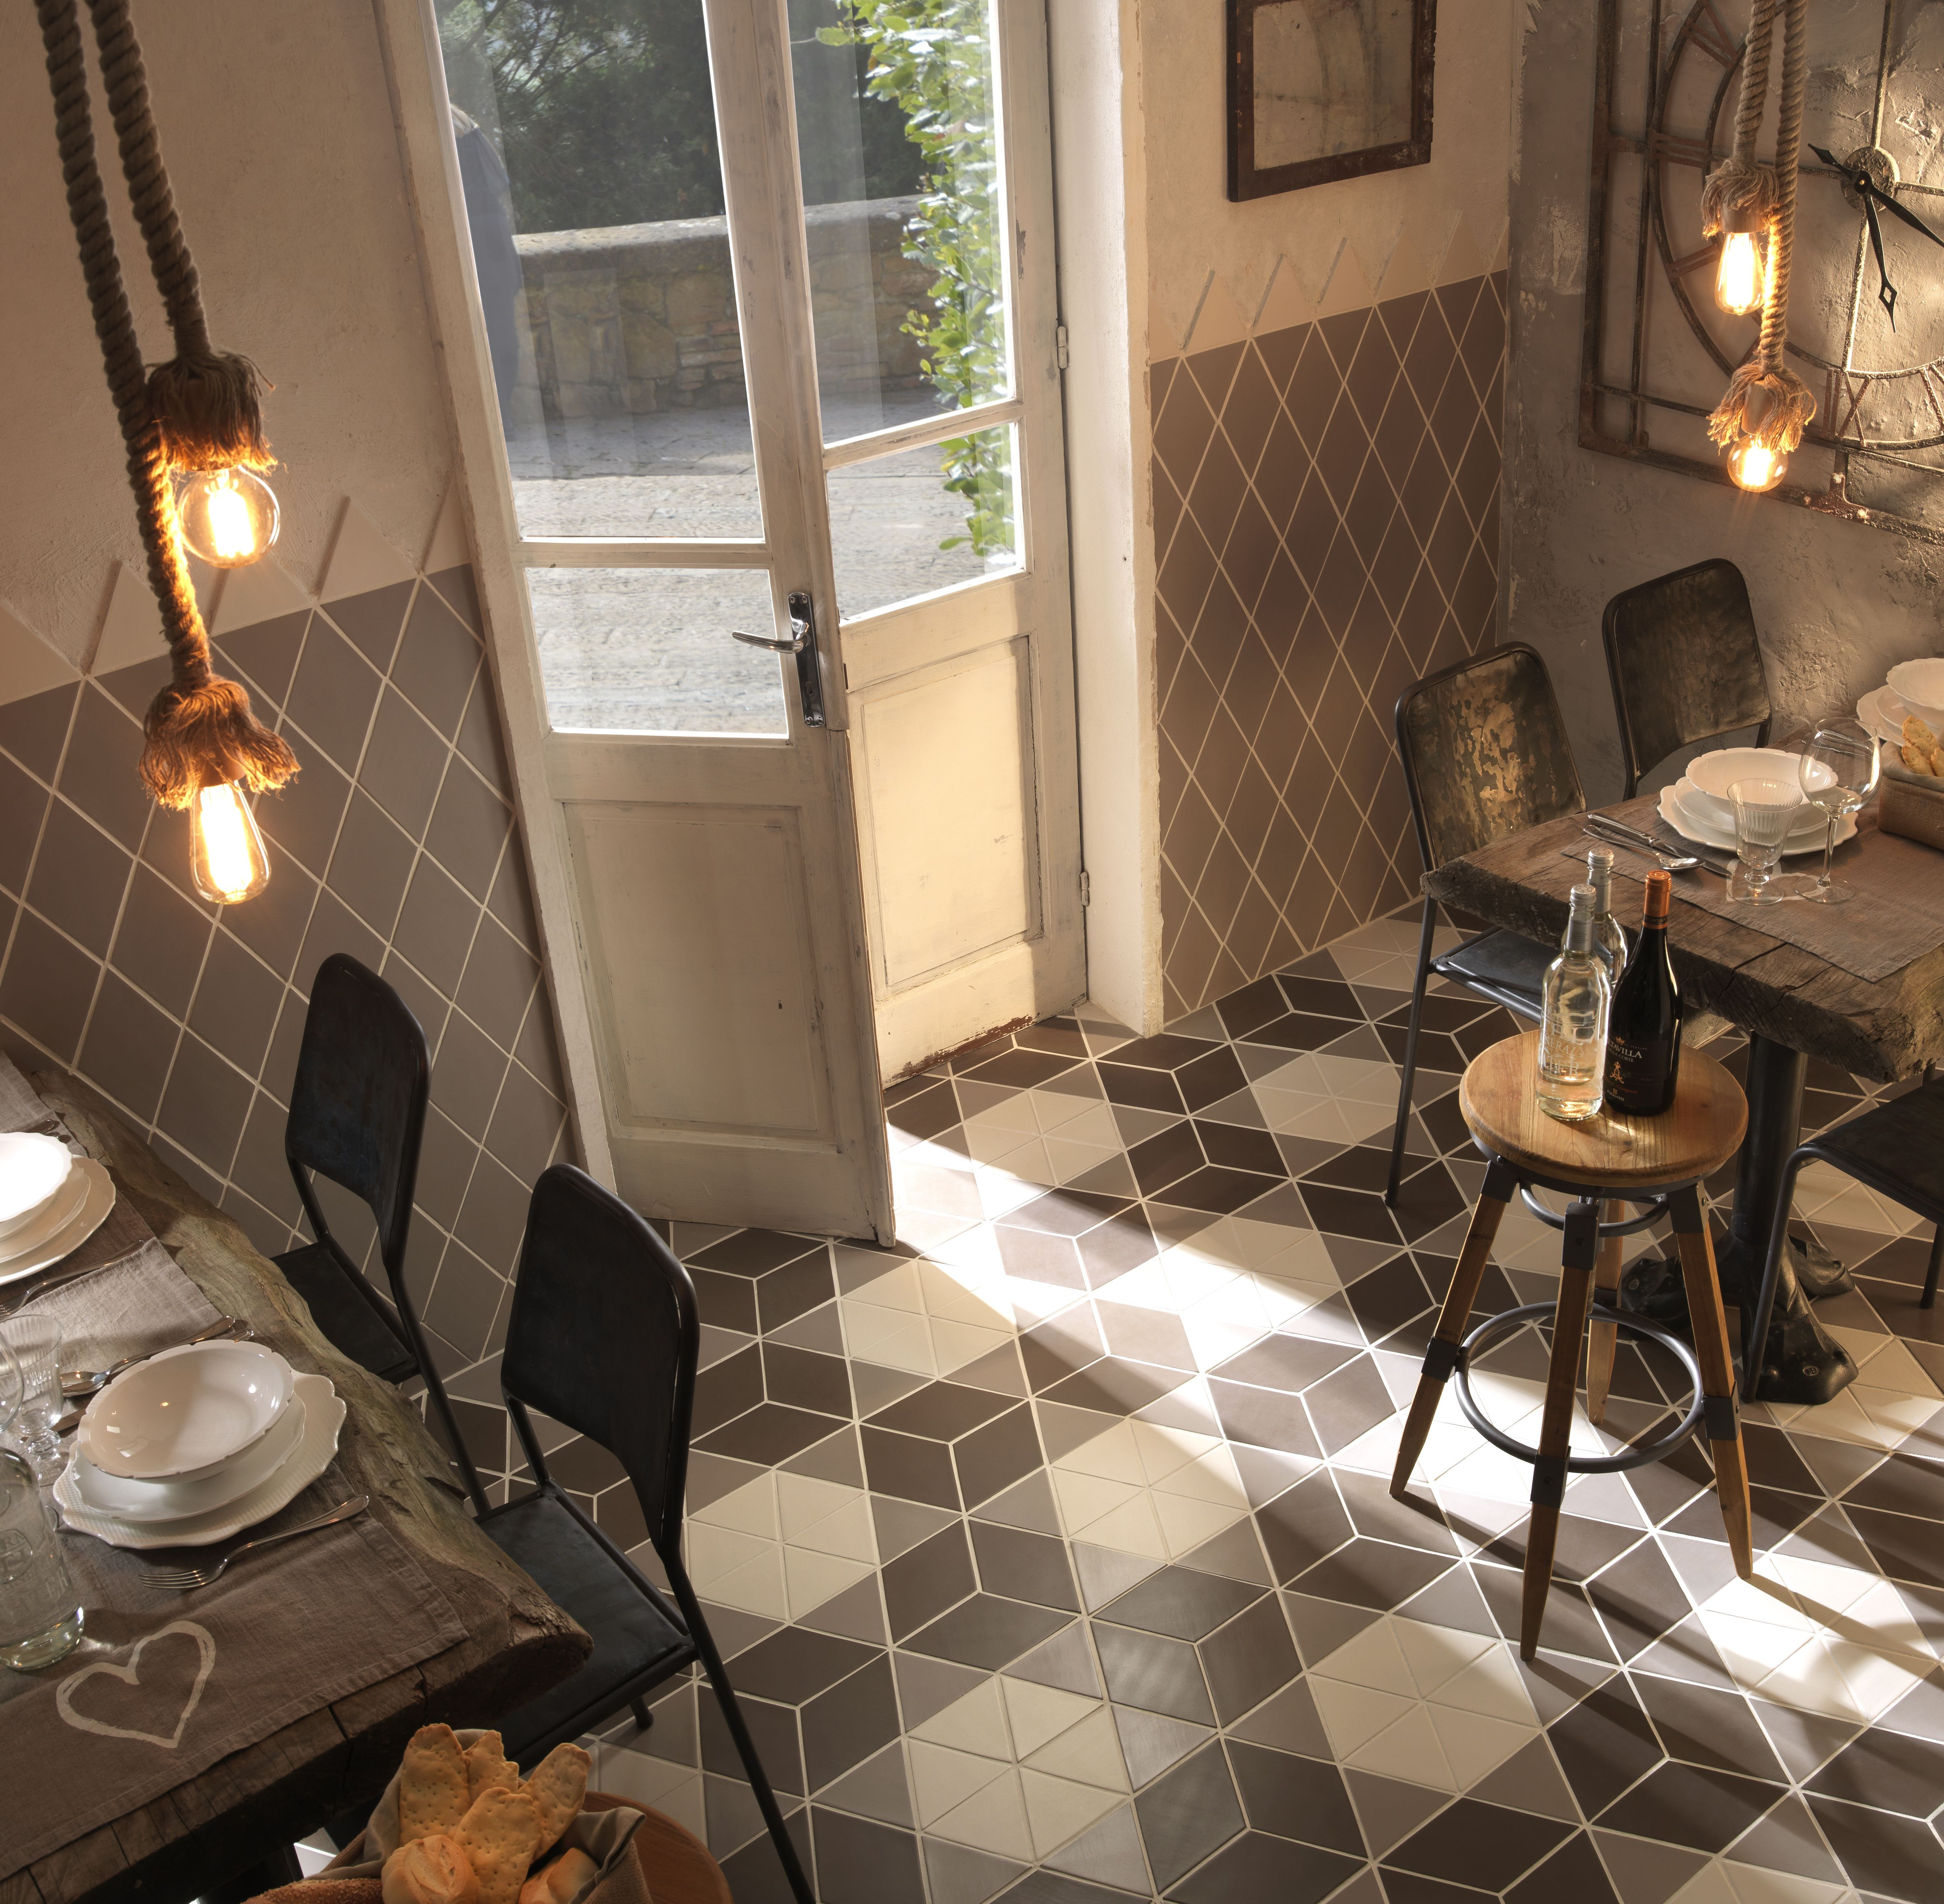 tonalite collezione geomat forma rhombus tiles piastrelle shape ...